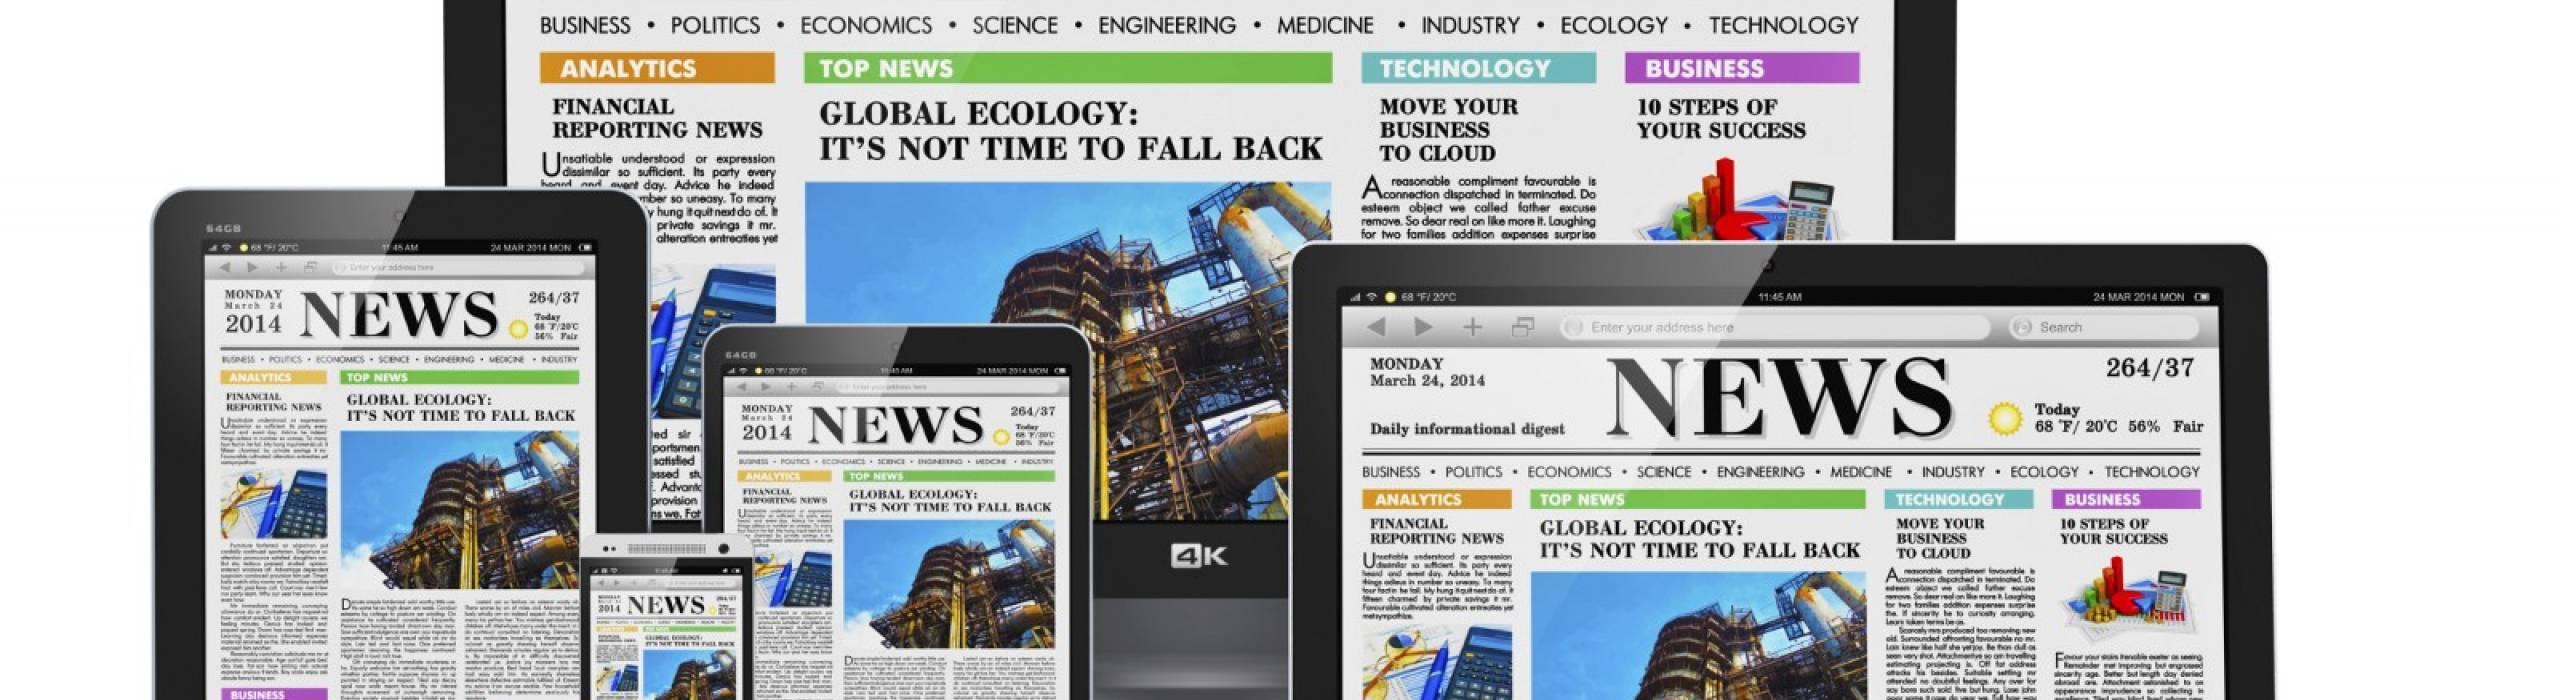 Digital news stock photo